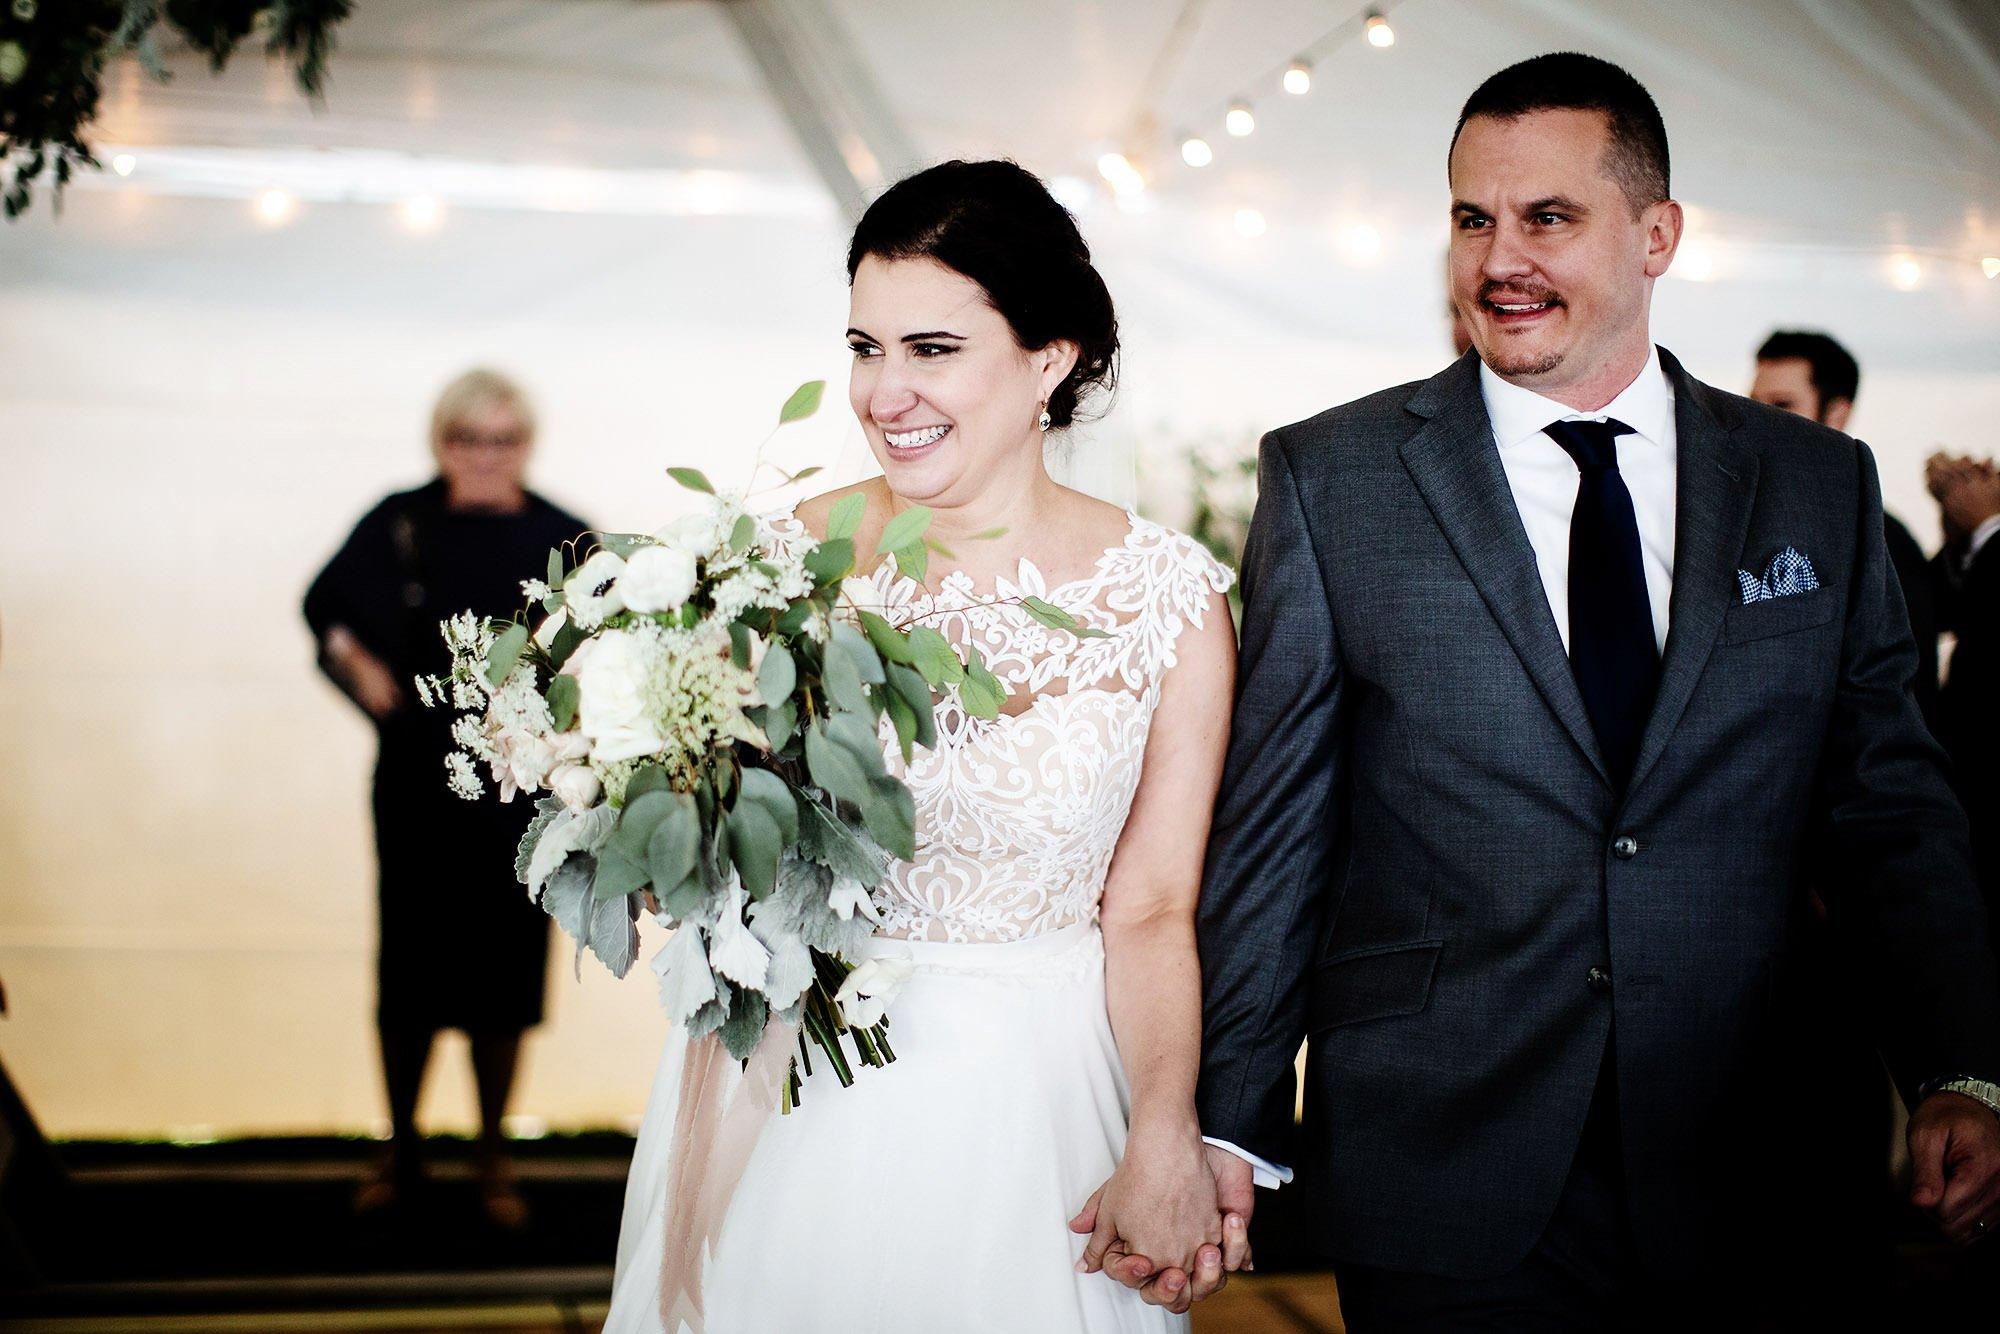 The couple walks down the aisle during their Pelham House Resort wedding.